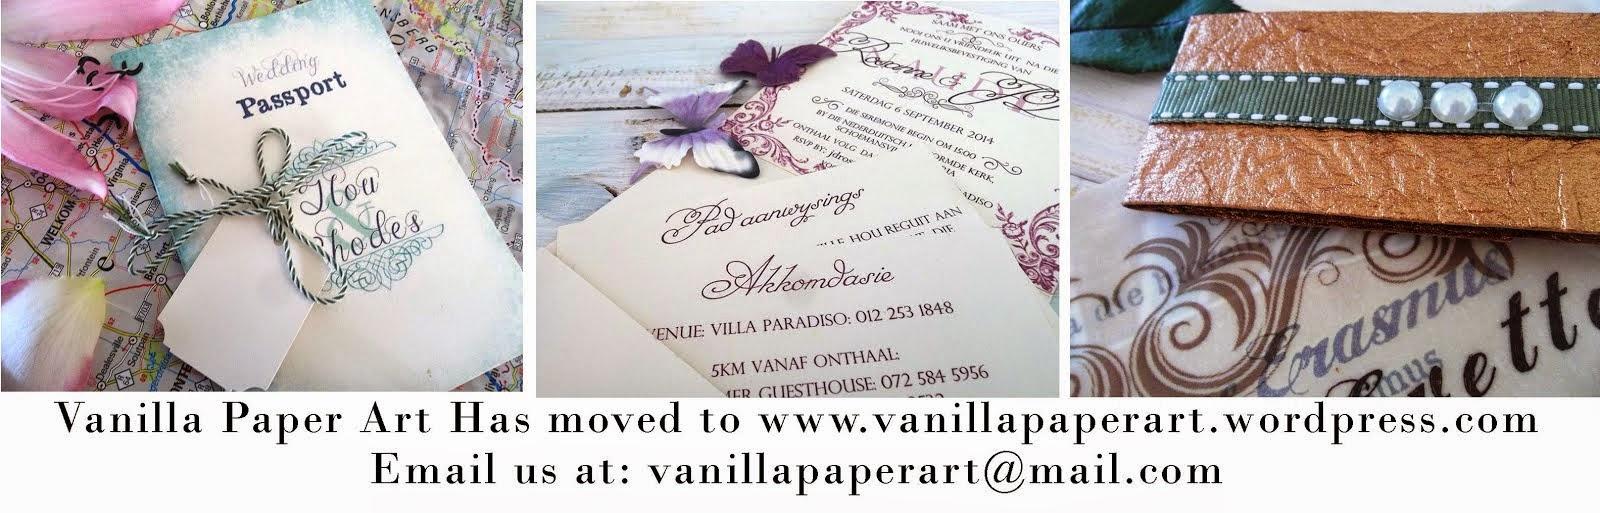 Vanilla Paper Art